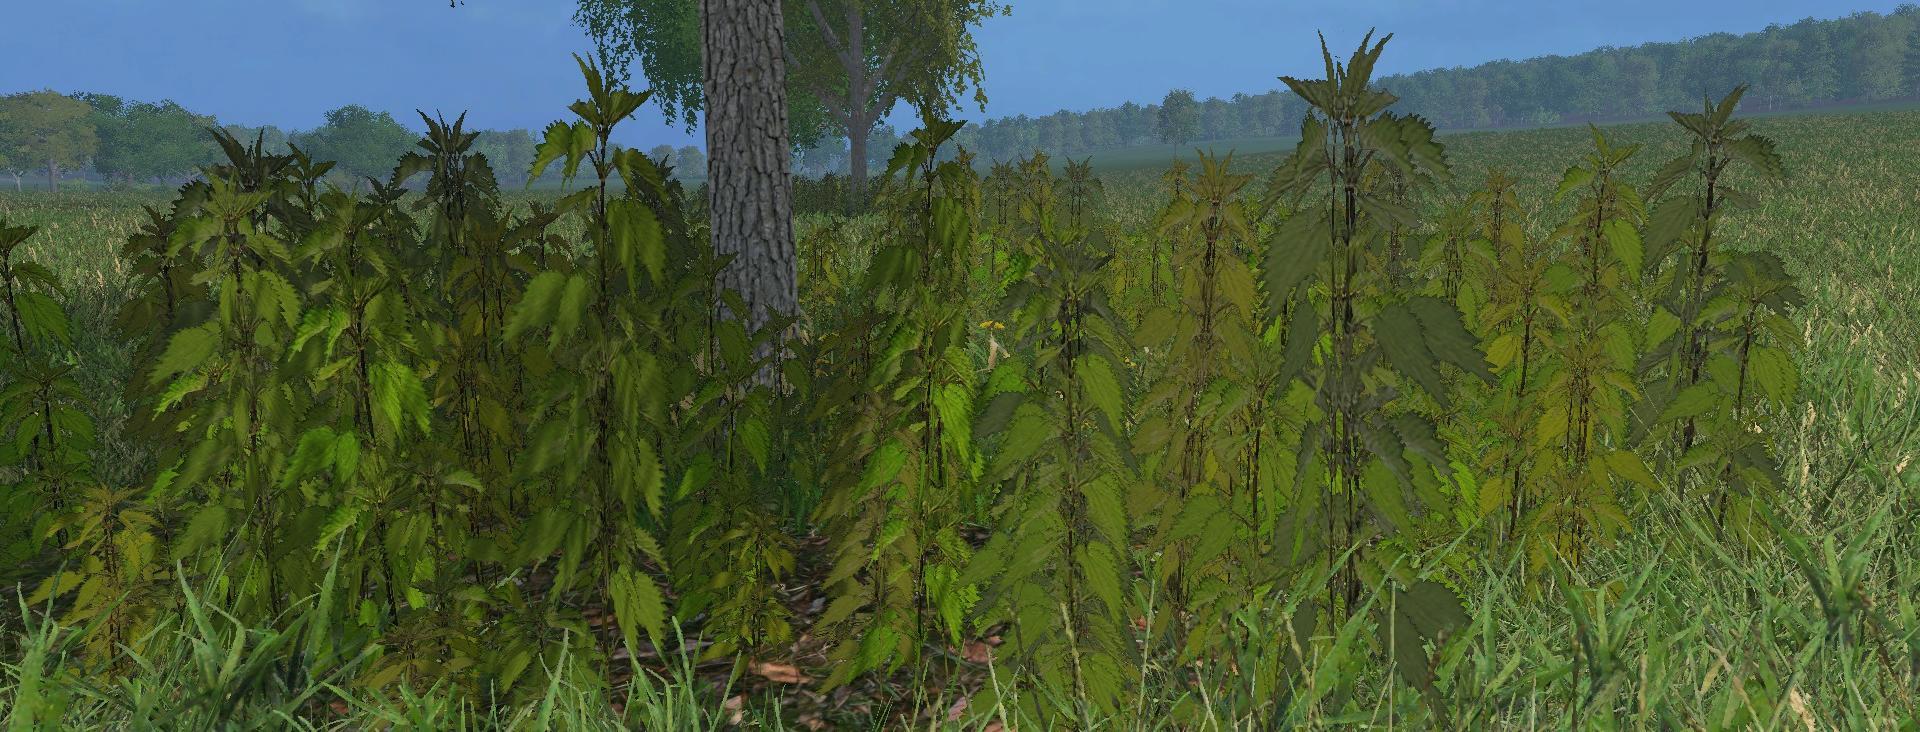 nettles-foliage-texture-v1-0_2